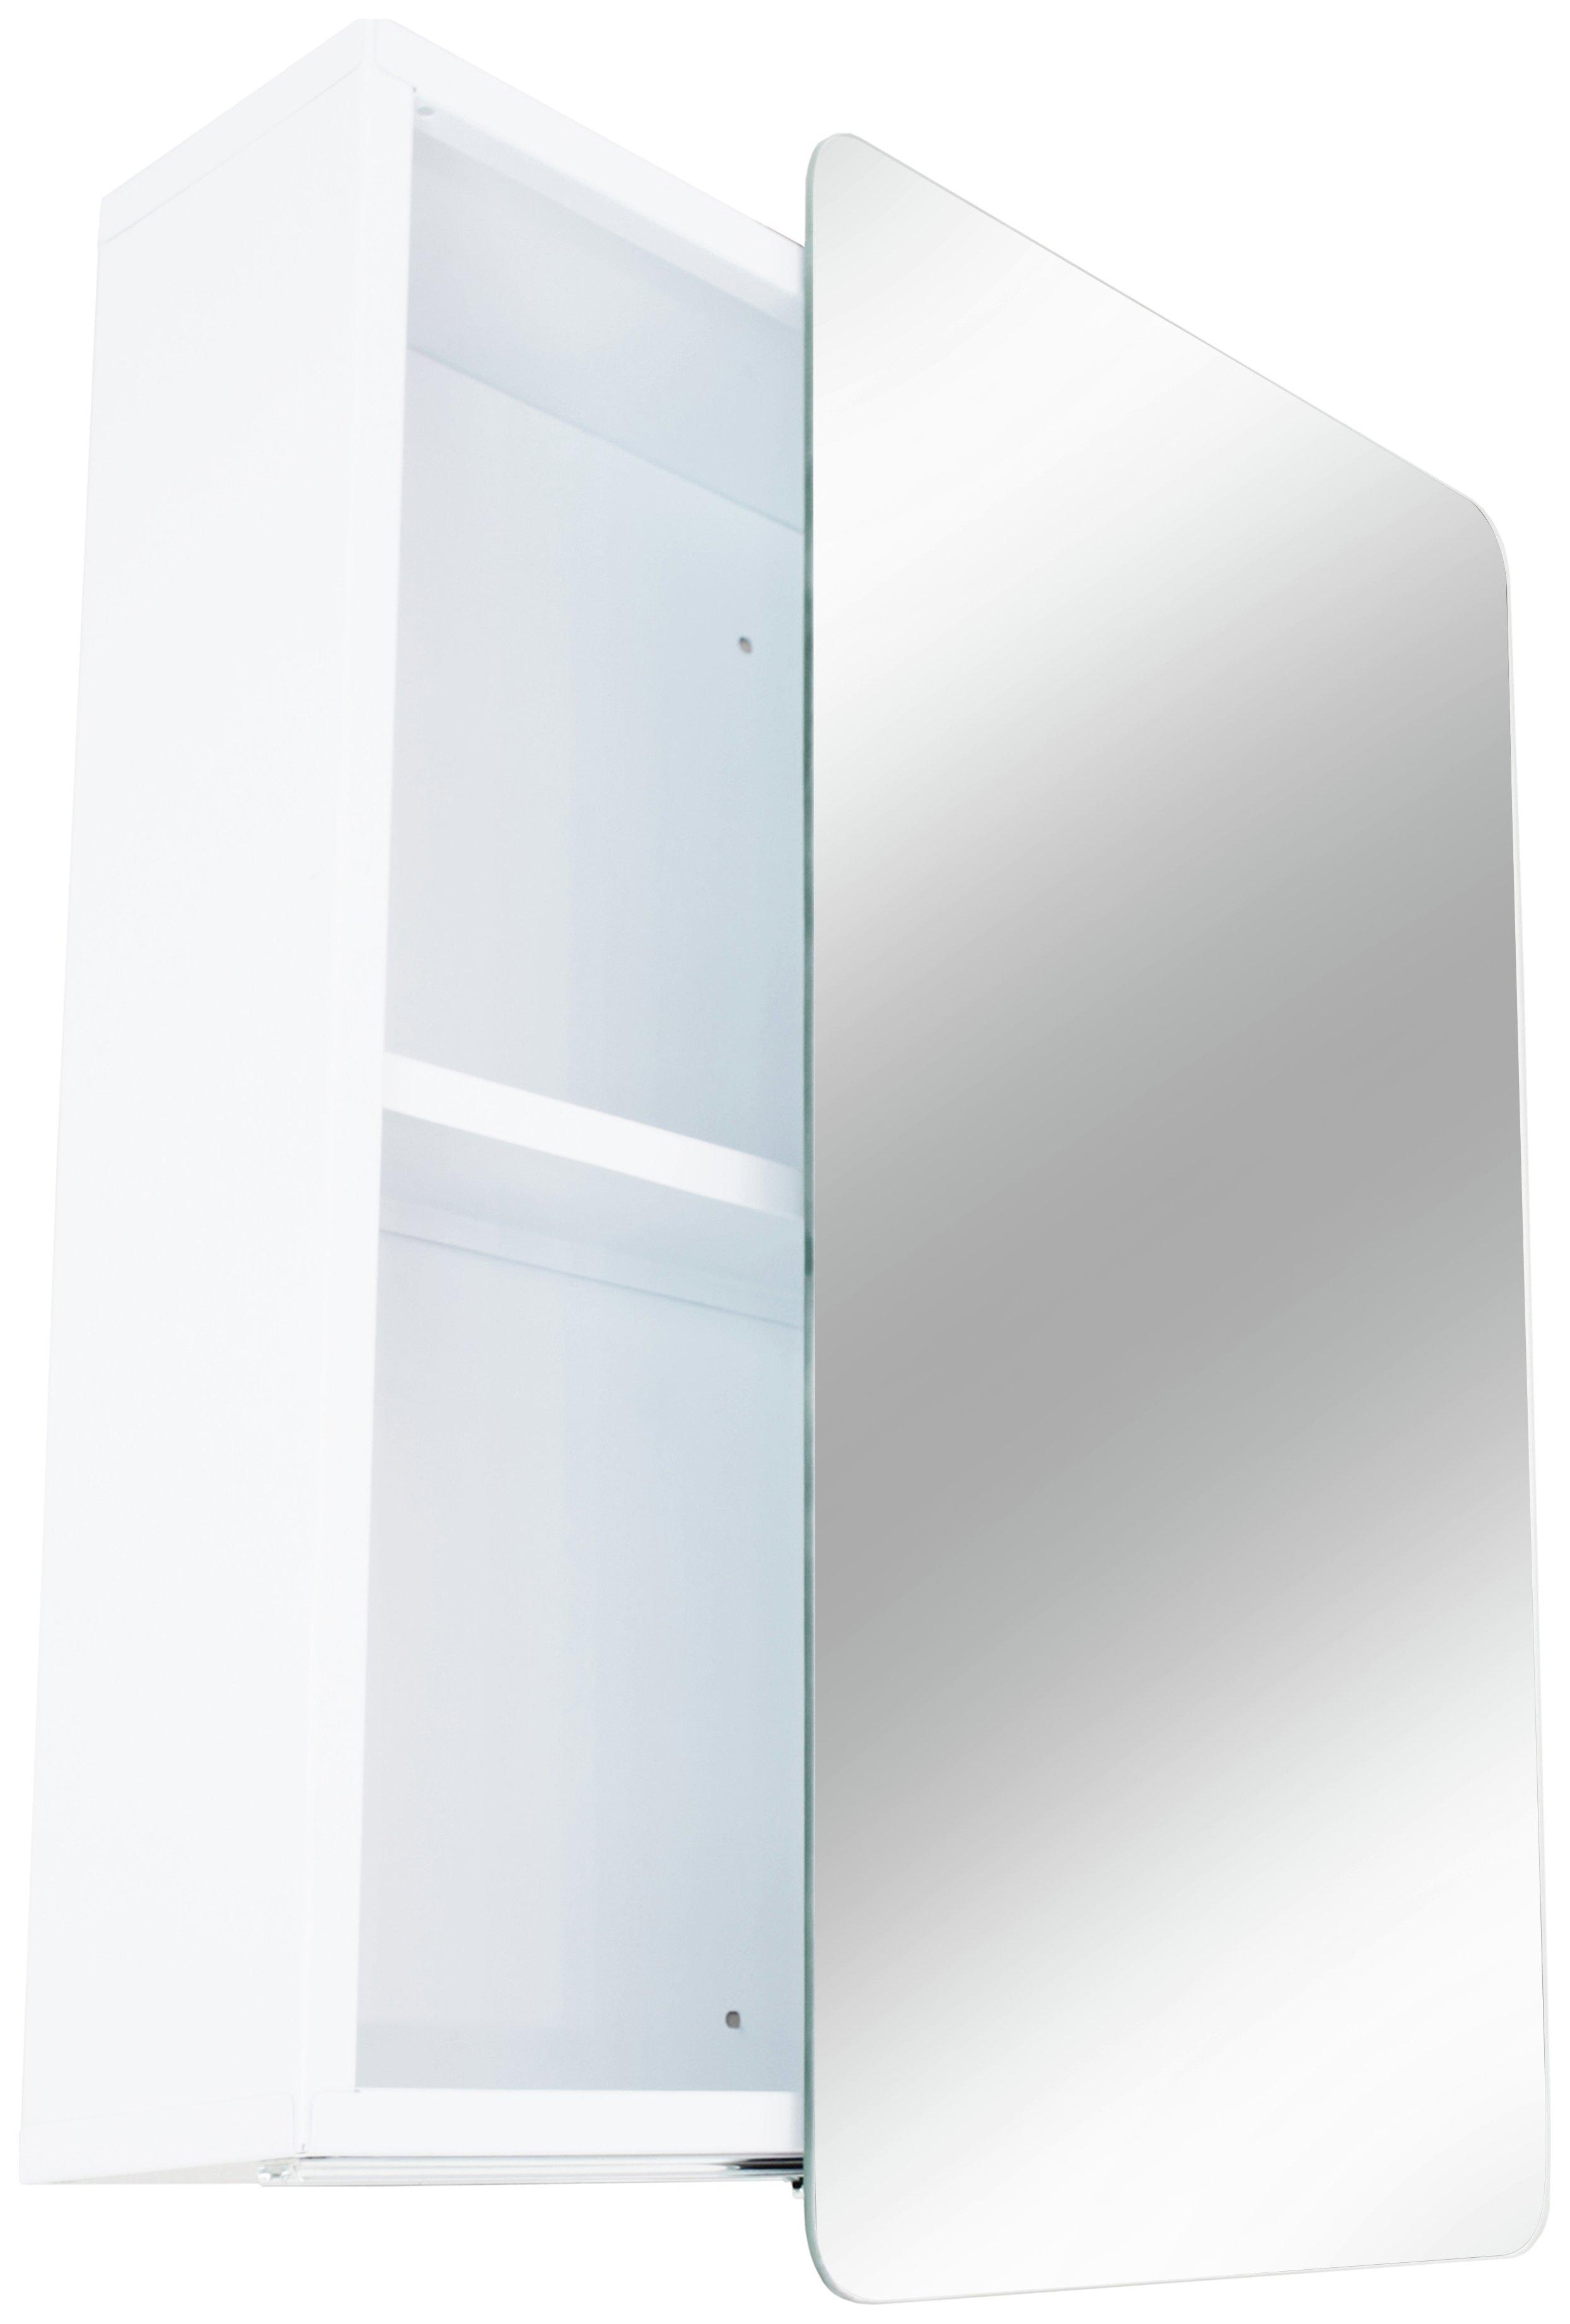 Buy Hygena Sliding Door Mirror Bathroom Cabinet White at Argos